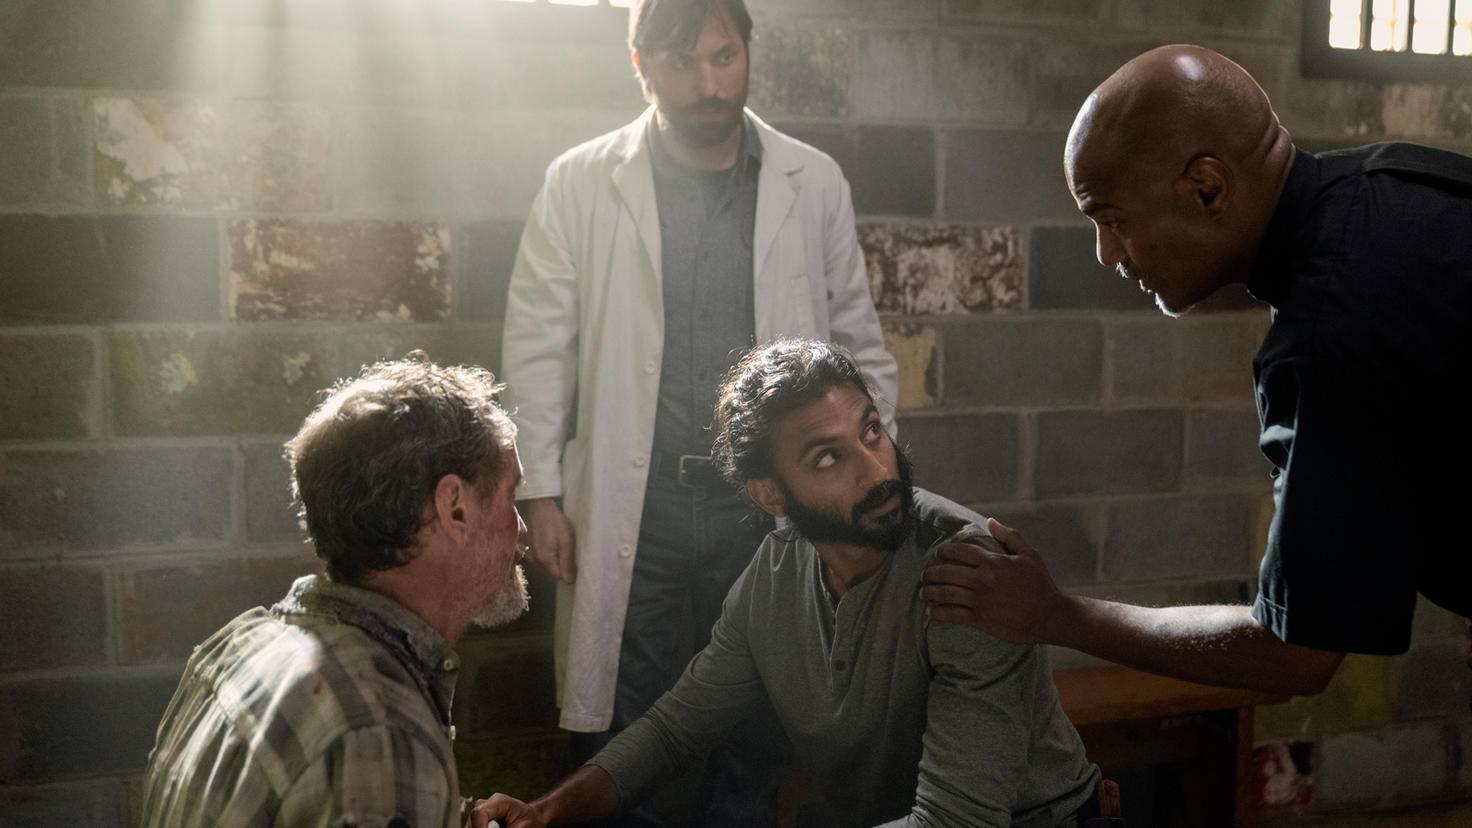 The Walking Dead-S10E07-Siddiq-Dante-Gabriel-Whisperer-Jace Downs-AMC